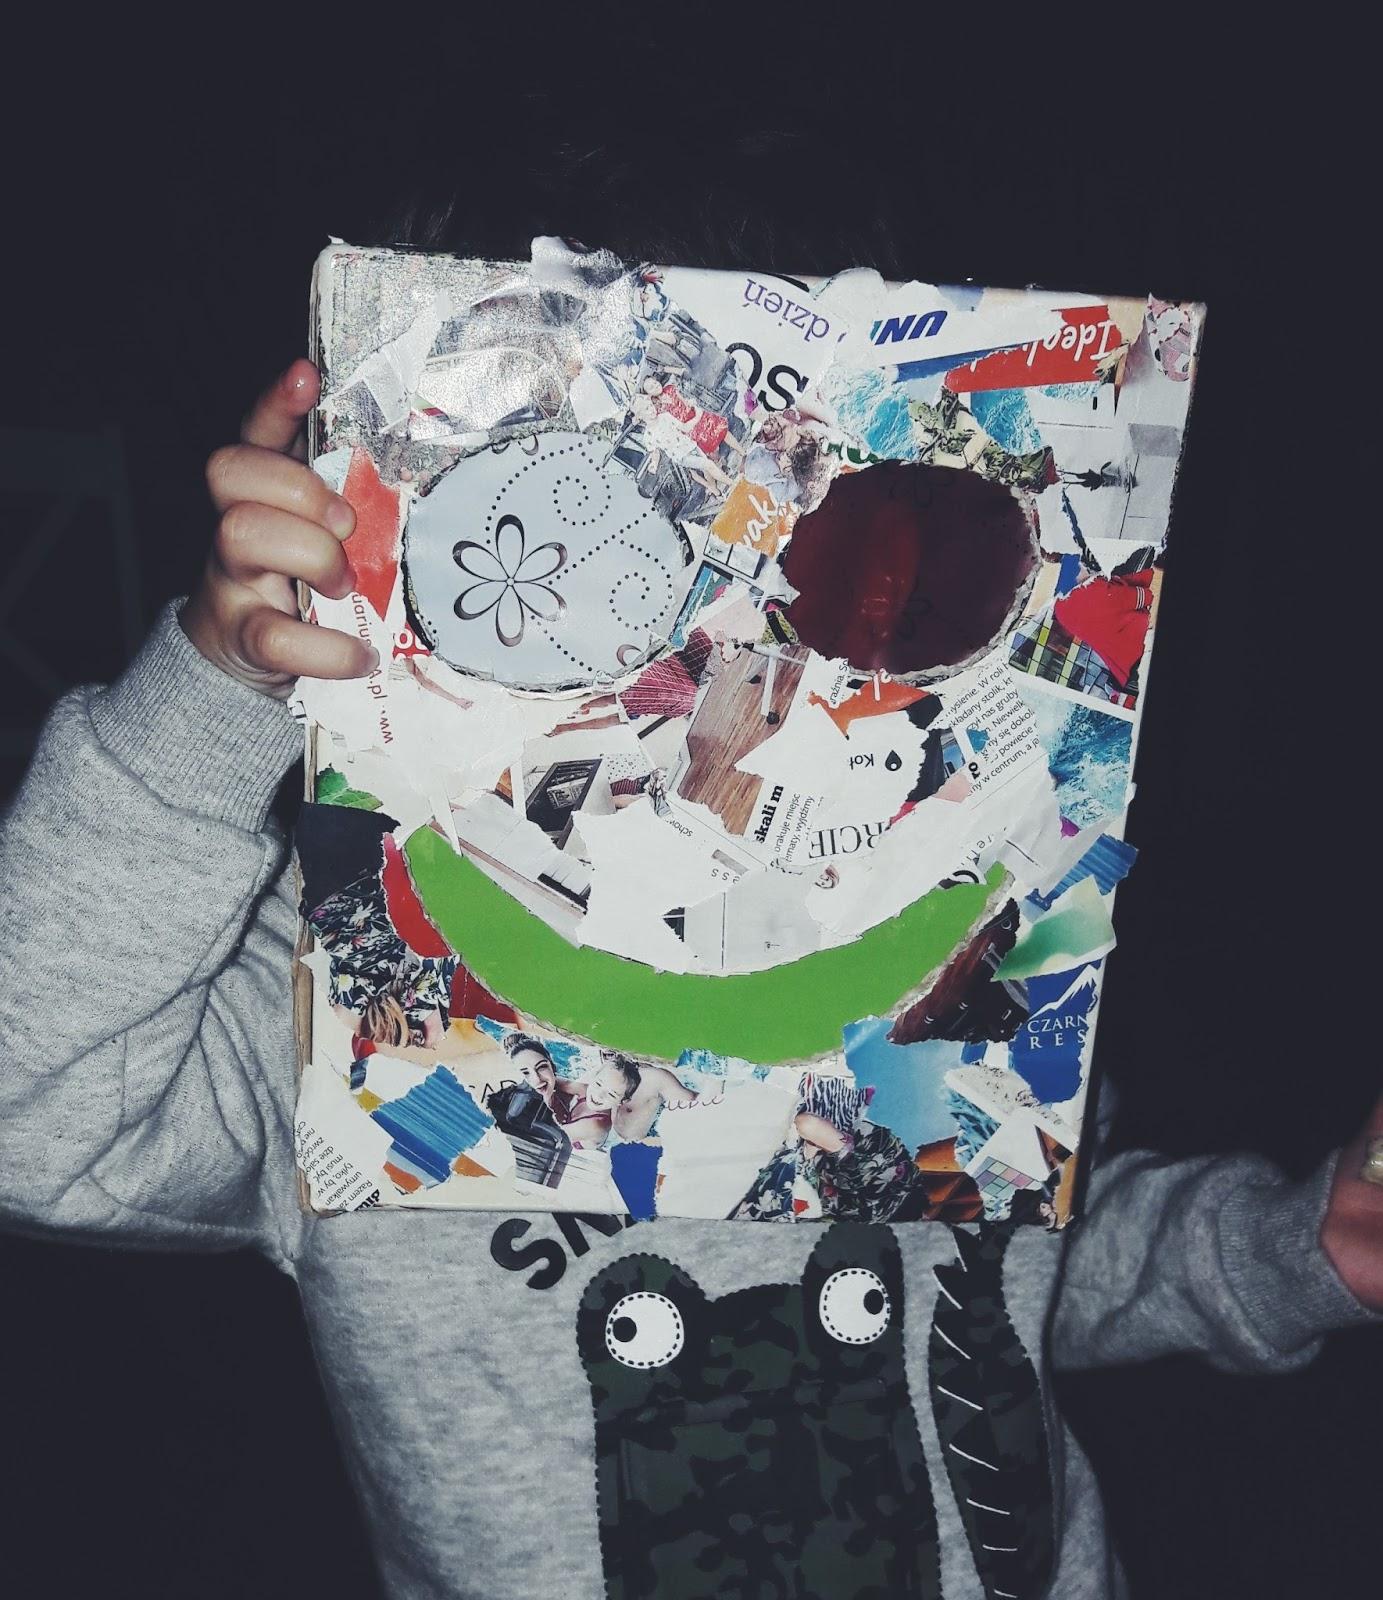 Cudowna maska robota - blog tocusiowo - maska gotowa